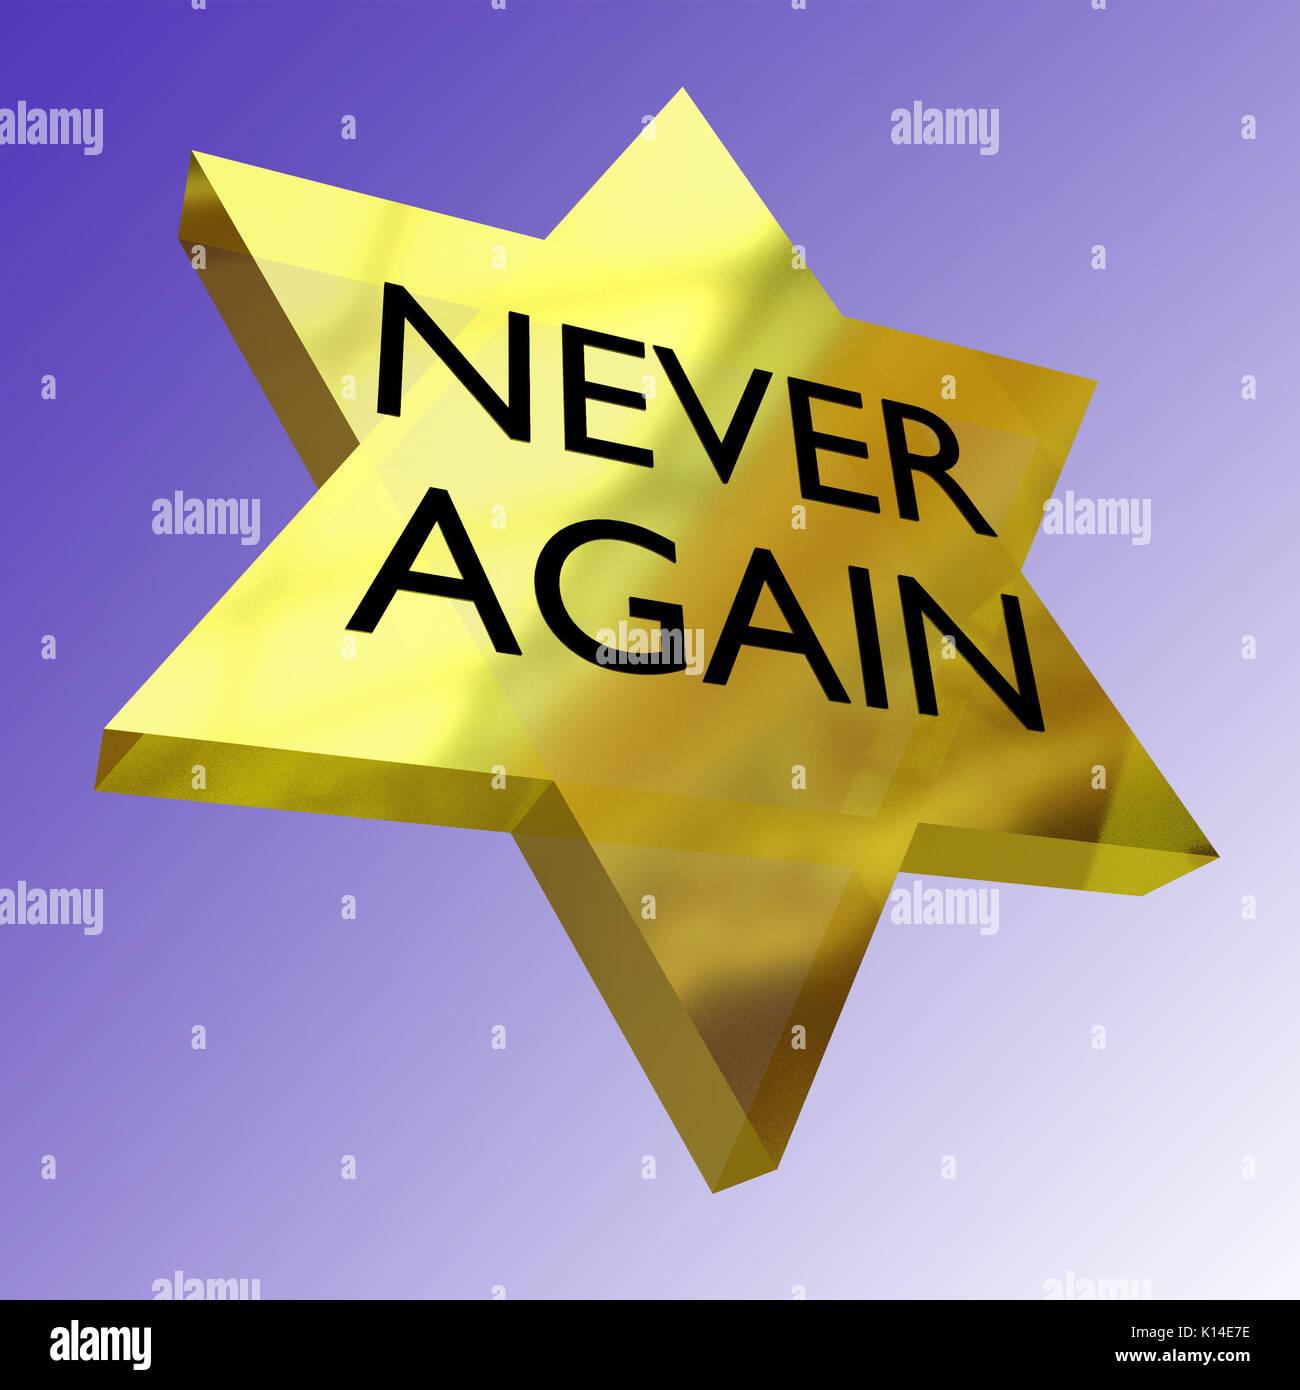 Never Again >> 3d Illustration Of Never Again Script On David Star Stock Photo